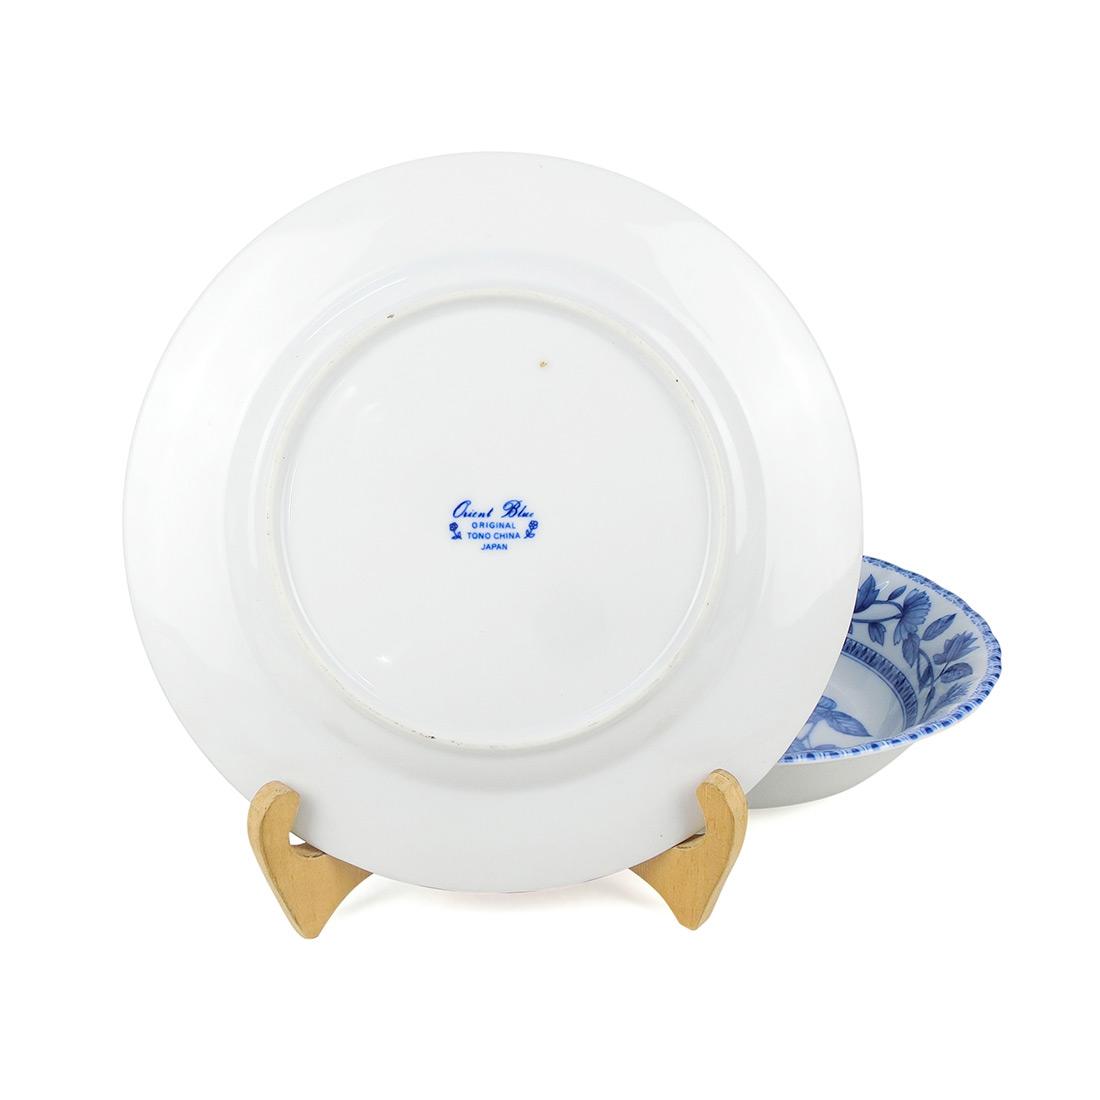 Bộ Tô Dĩa Sứ Hoa Men Lam Tono - Nhật - 423296